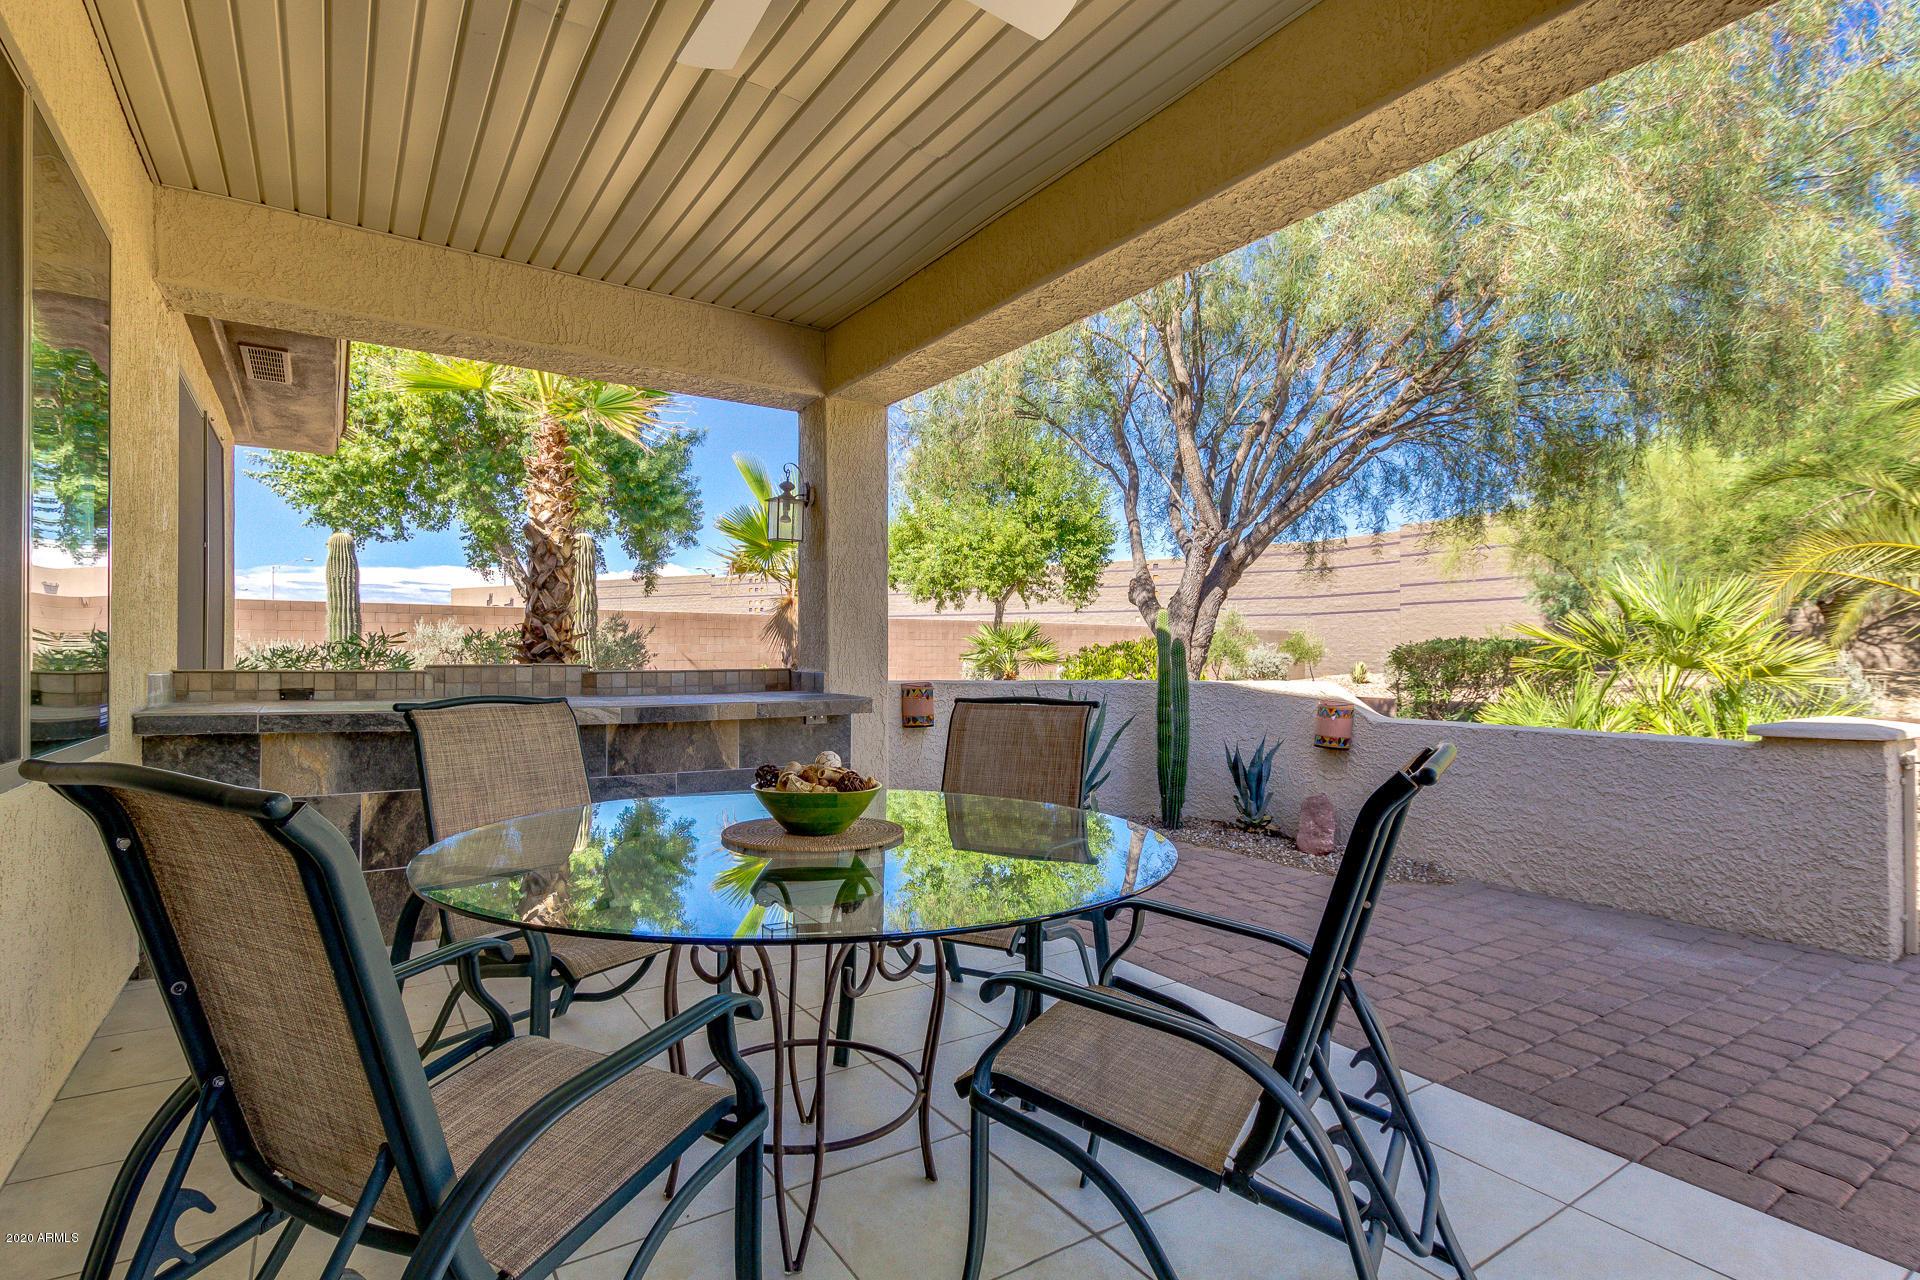 21437 N OLMSTED POINT Lane, Surprise, Arizona 85387, 3 Bedrooms Bedrooms, ,2 BathroomsBathrooms,Rental,For Rent,21437 N OLMSTED POINT Lane,1,6105832